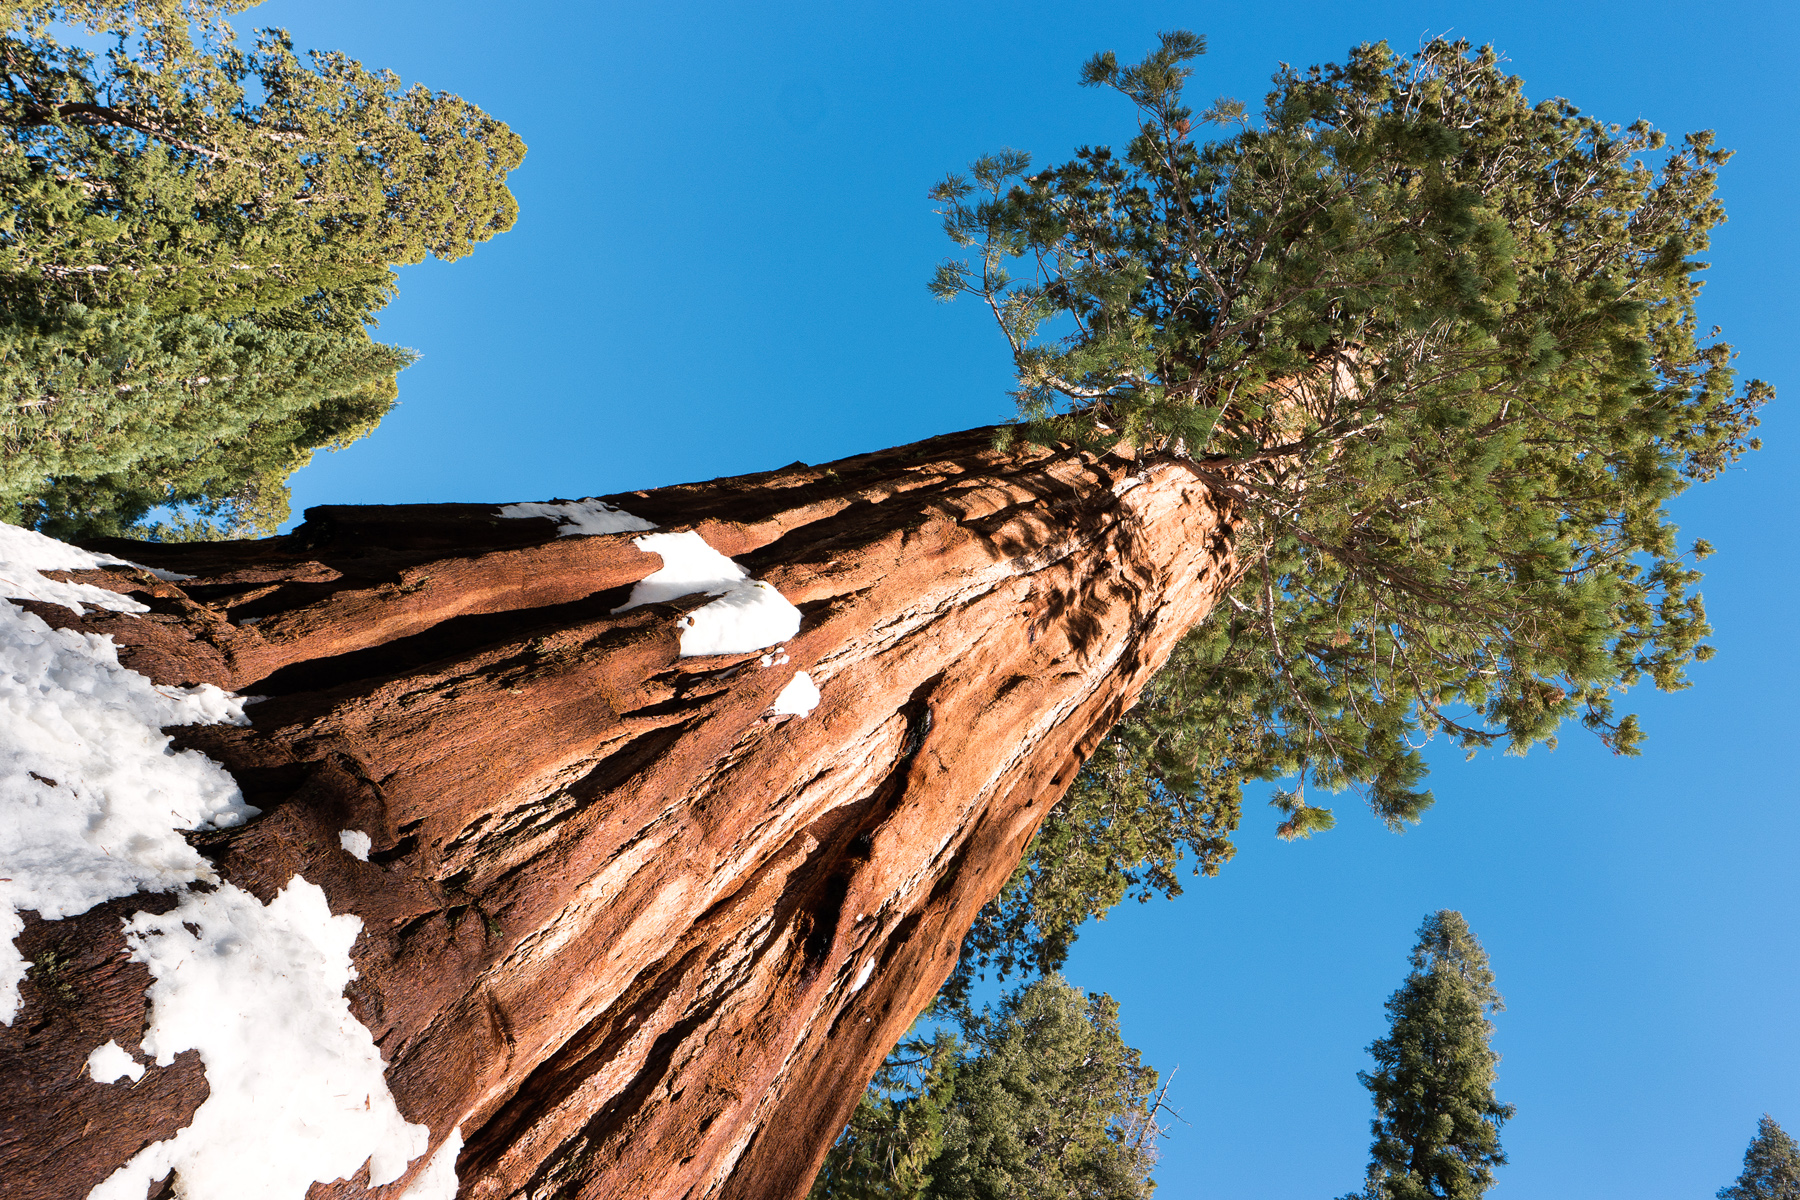 Wasim Muklashy Photography_Sequoia National Park_California_December 2015_-SAM_4582-Edit.jpg